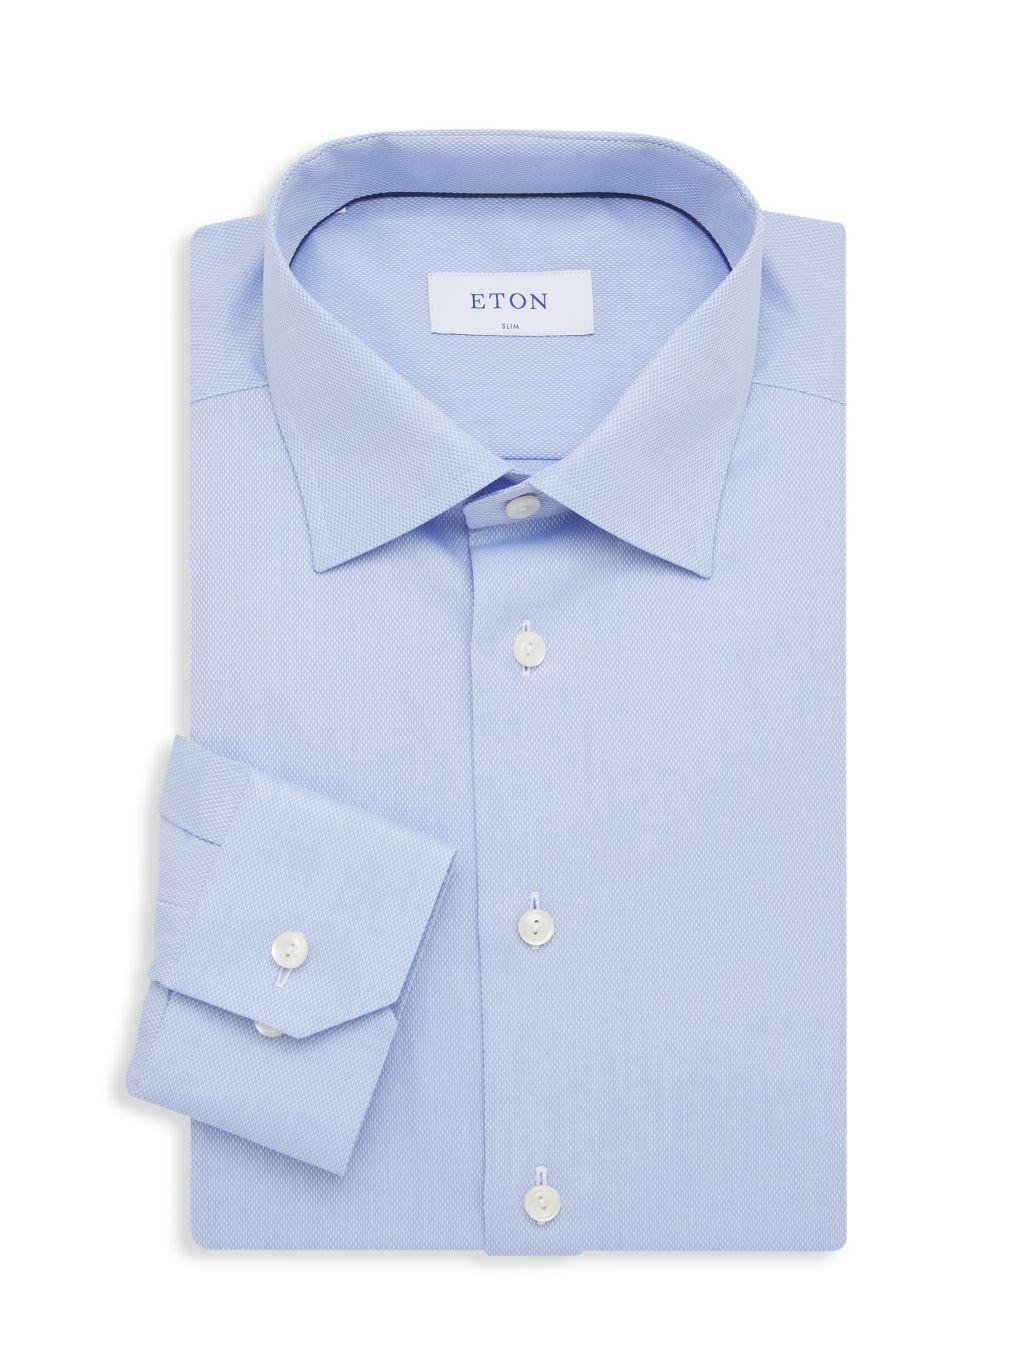 Eton Micro Weave Slim-Fit Dress Shirt